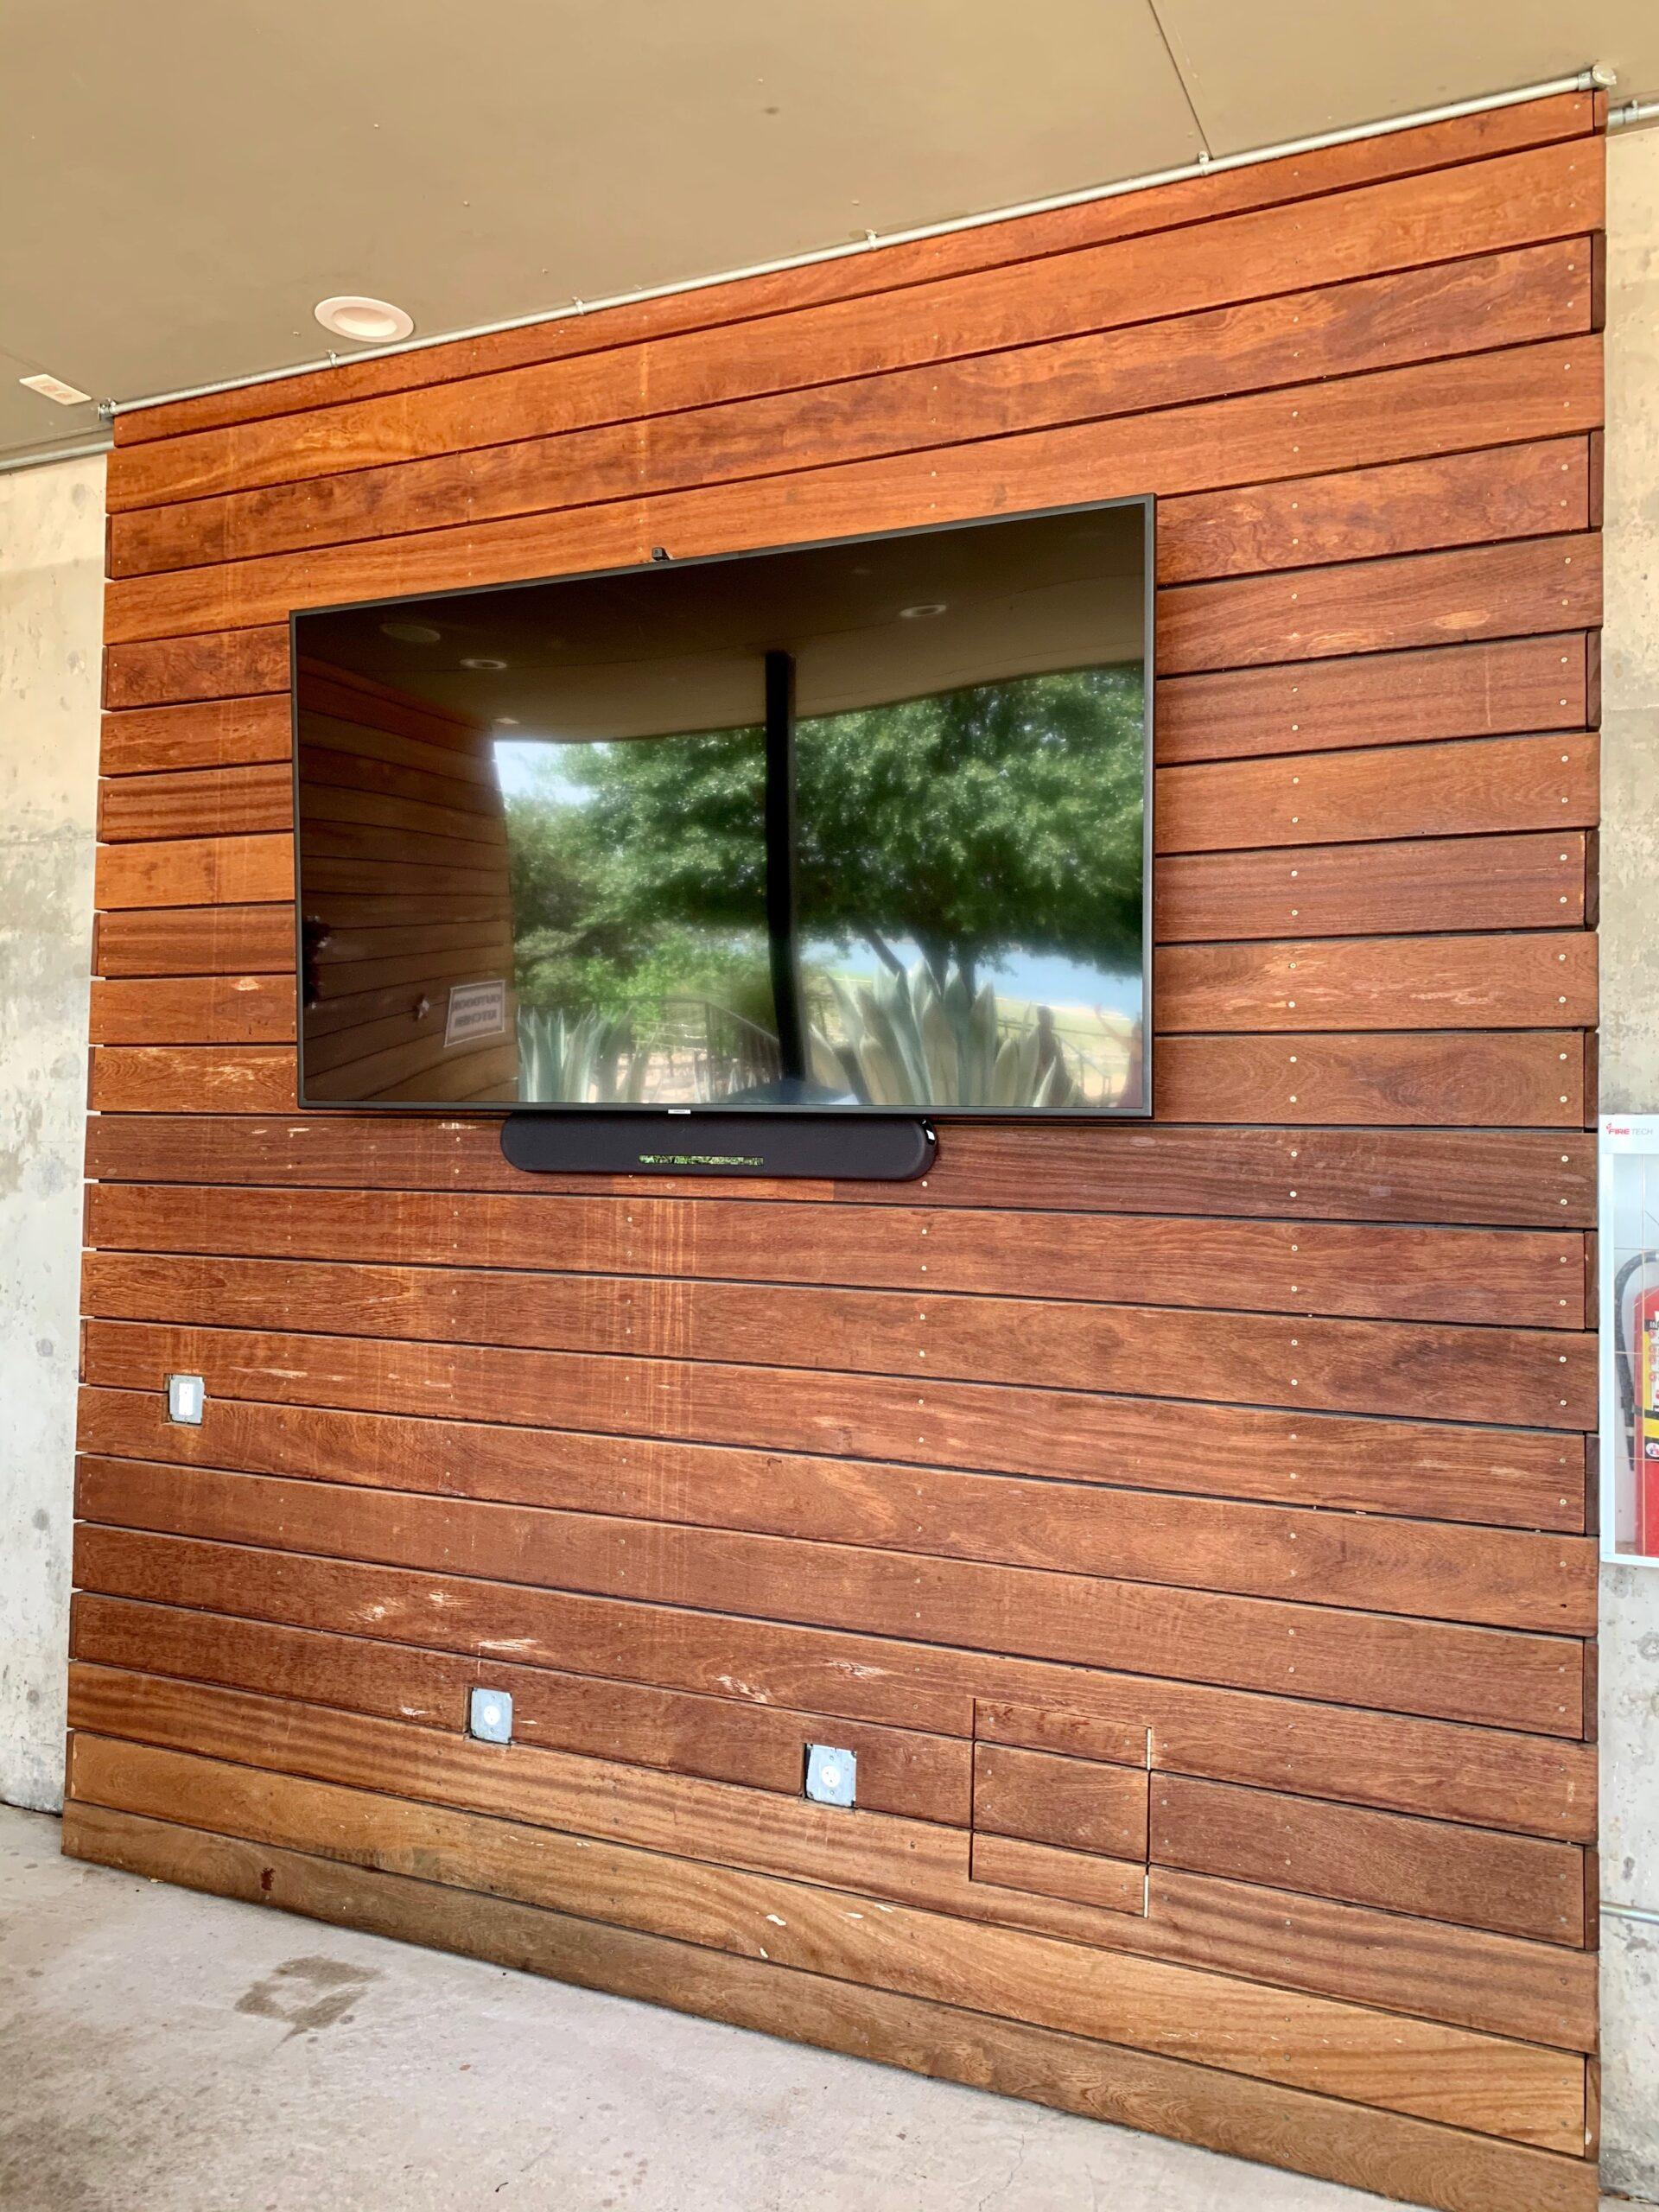 Outdoor TV mounted weatherproof TV installed on wood.